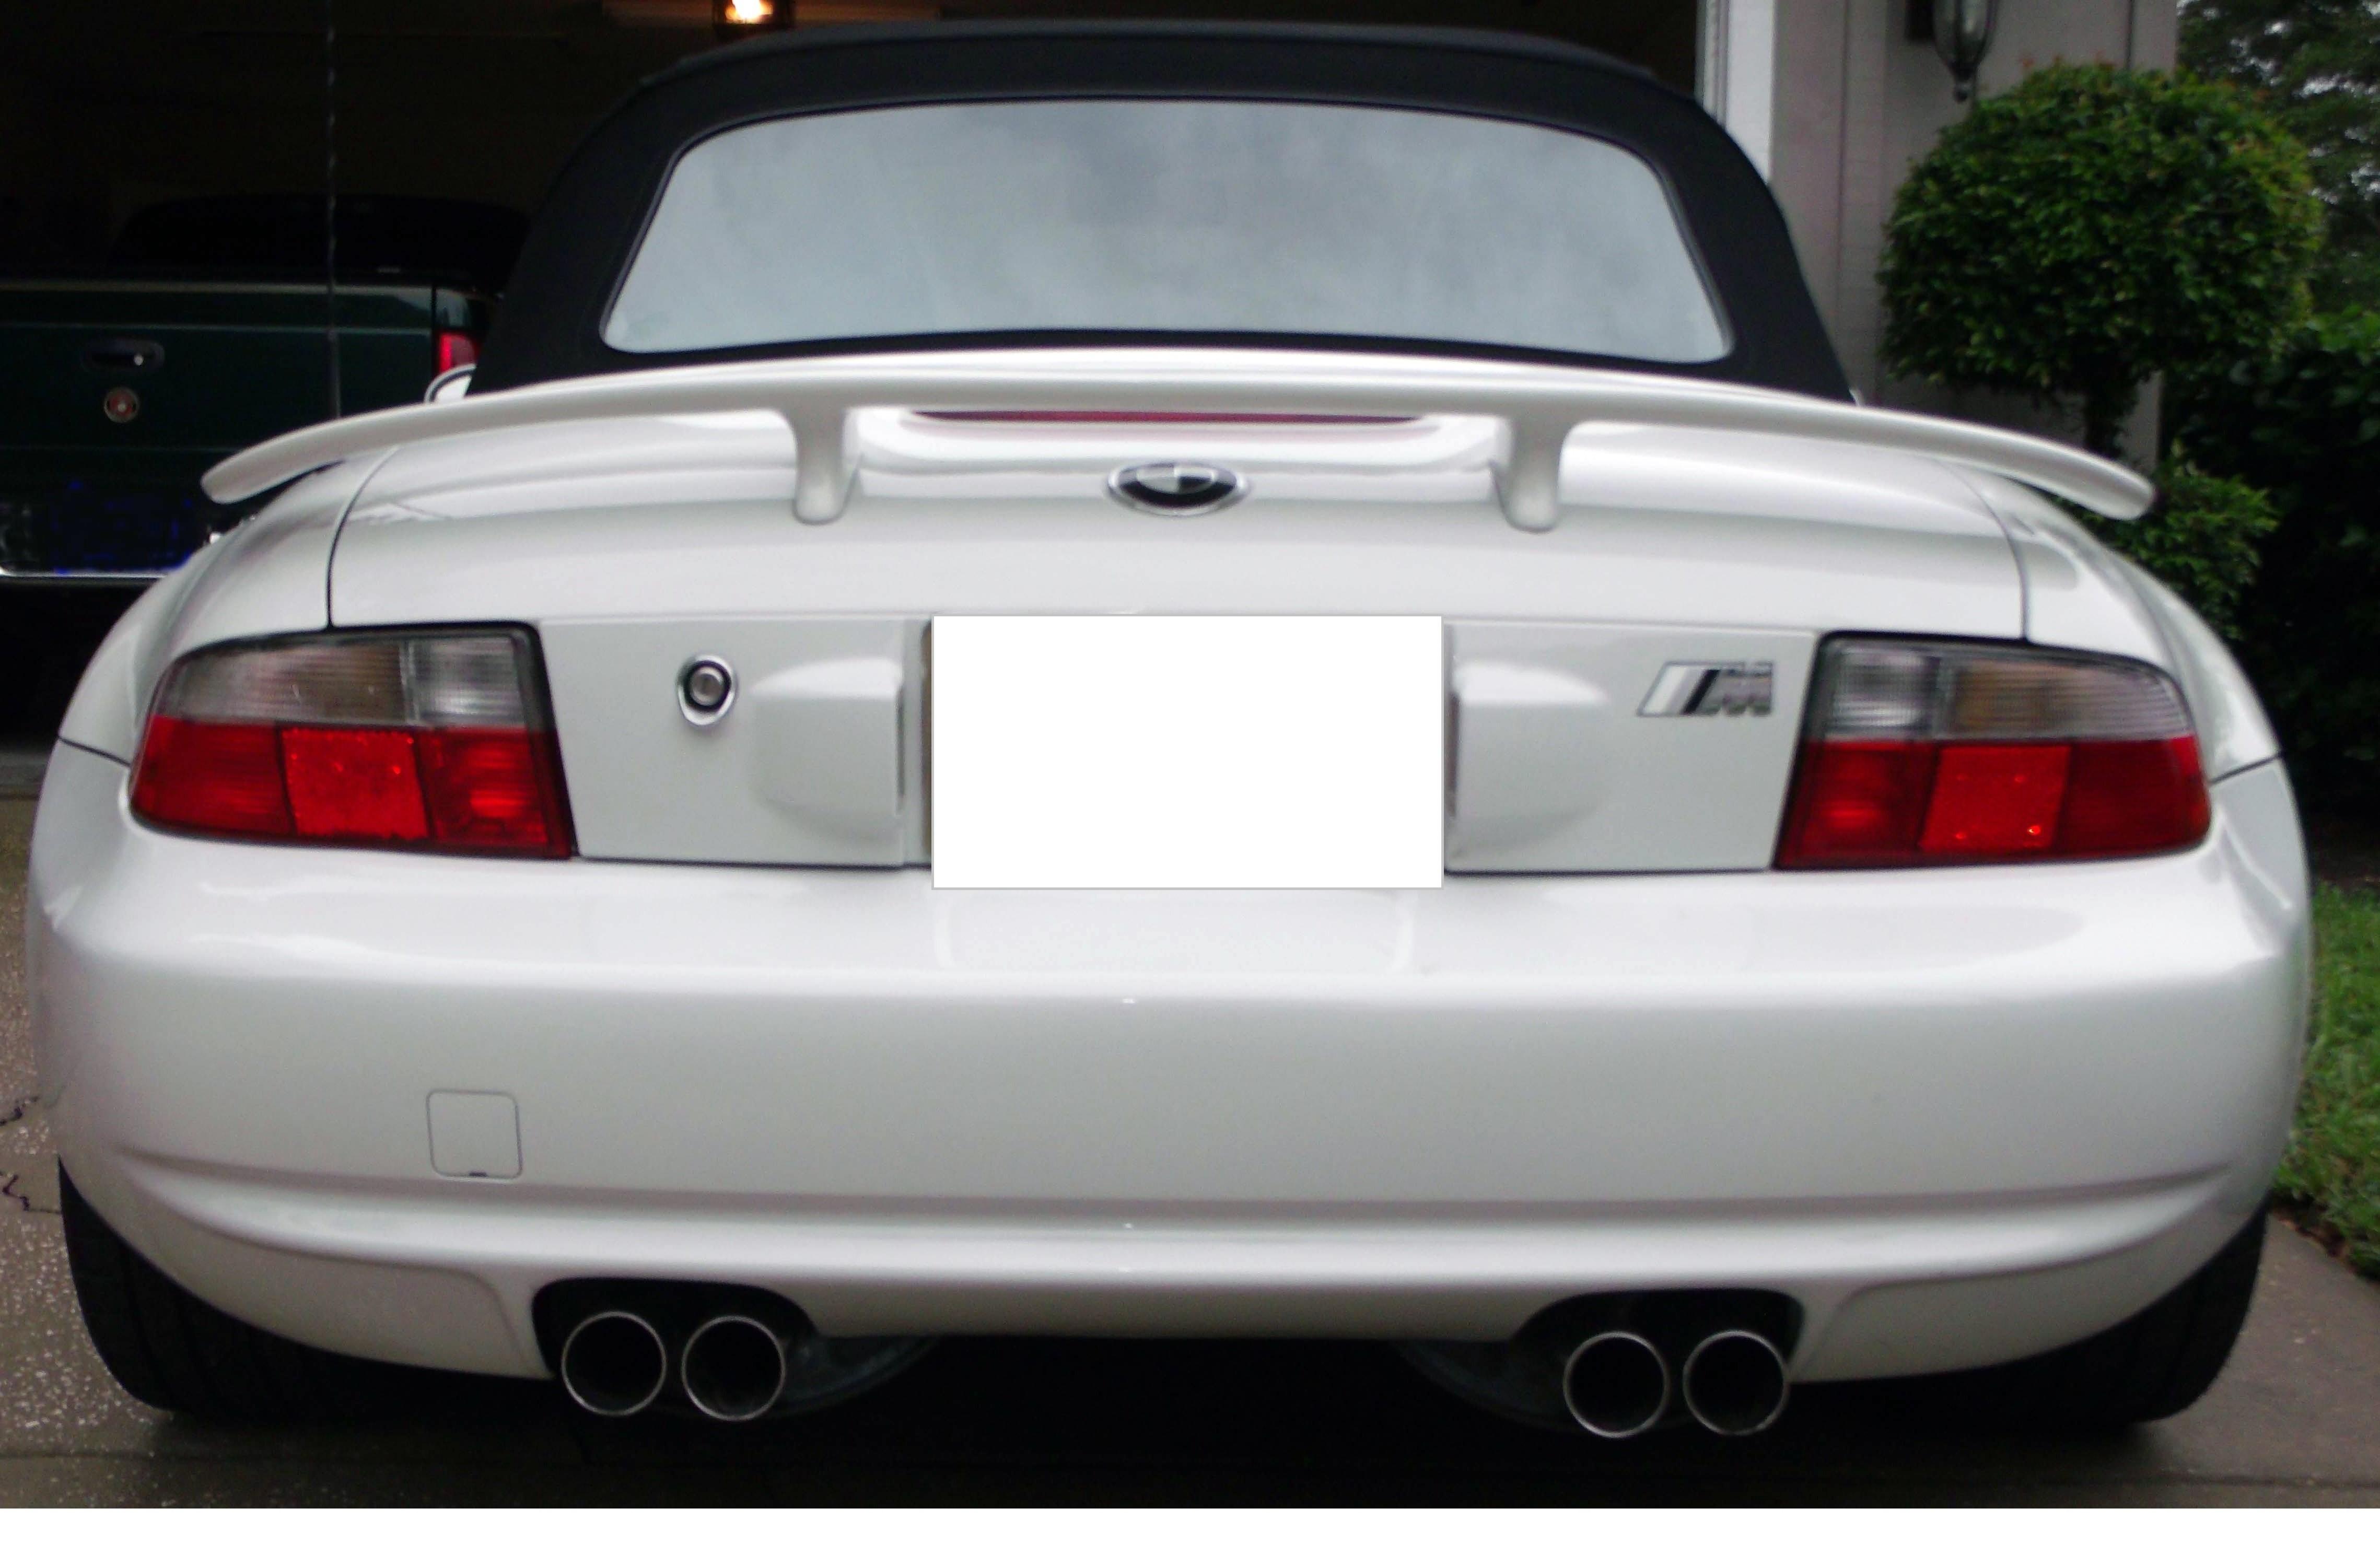 1999 2002 Bmw Z3 Tuner Style Rear Trunk Wing Spoiler